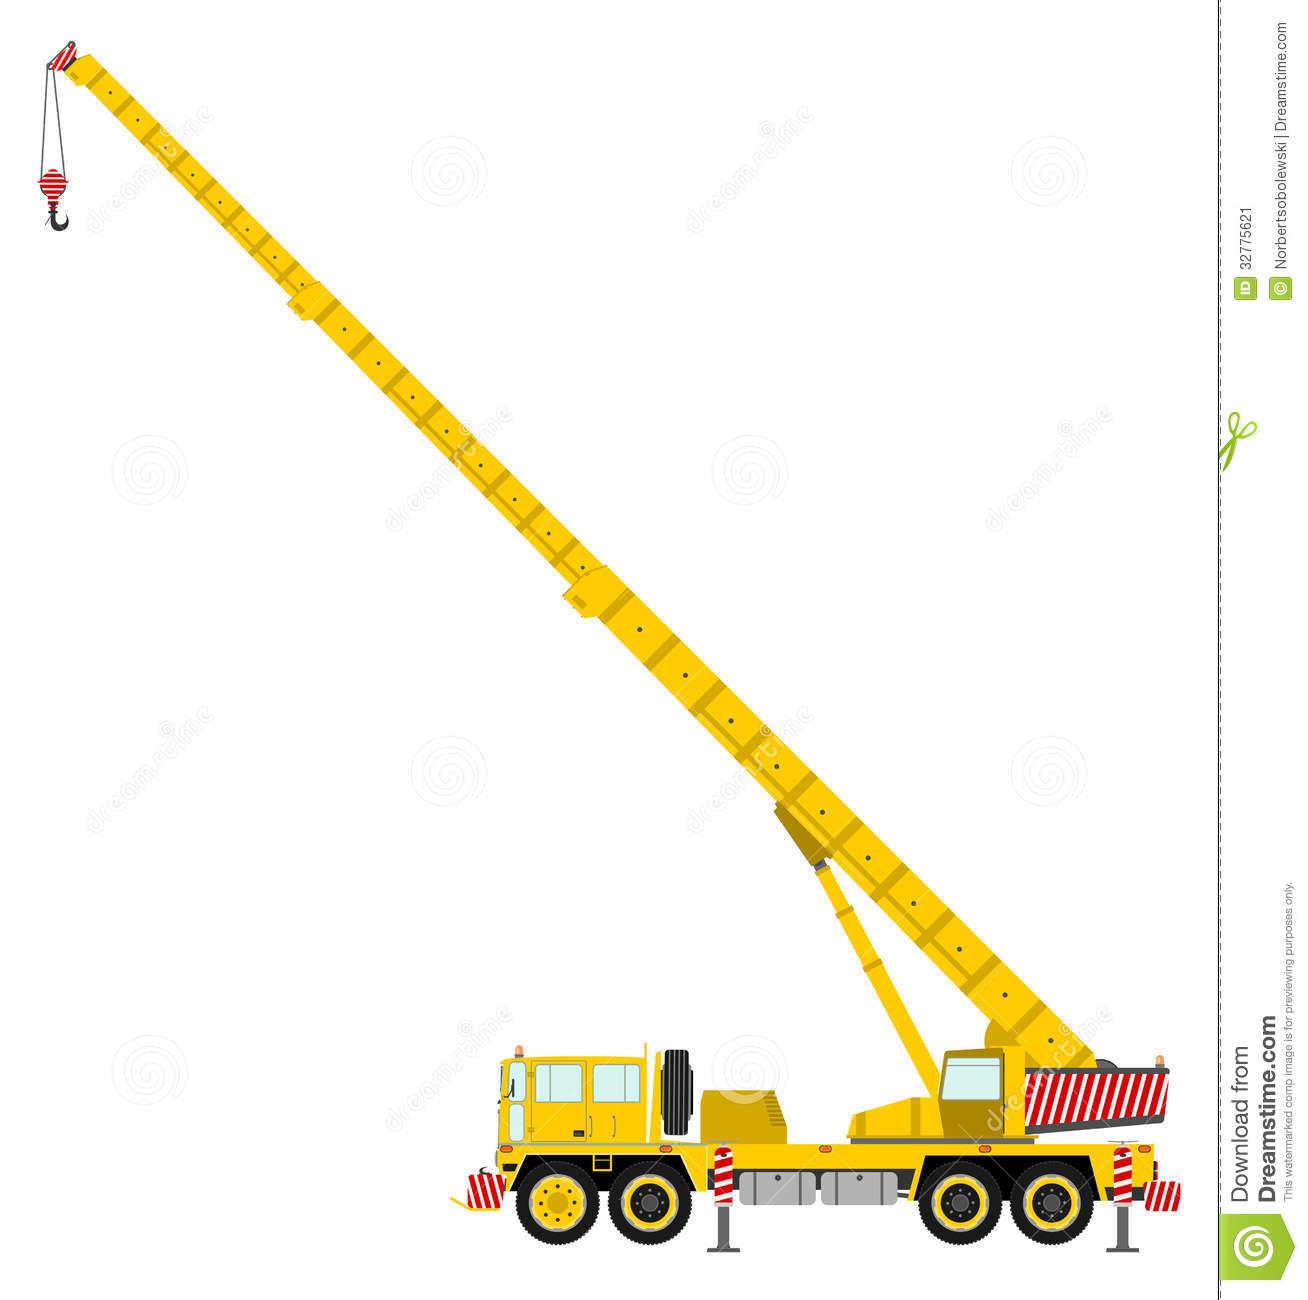 Mobile Crane Terminology : Crane clip art images clipart panda free